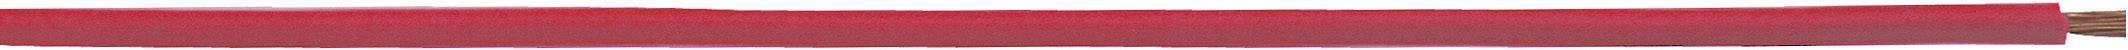 Opletenie / lanko LappKabel 4510023S H05V-K, 1 x 1 mm², vonkajší Ø 2.80 mm, 250 m, modrá